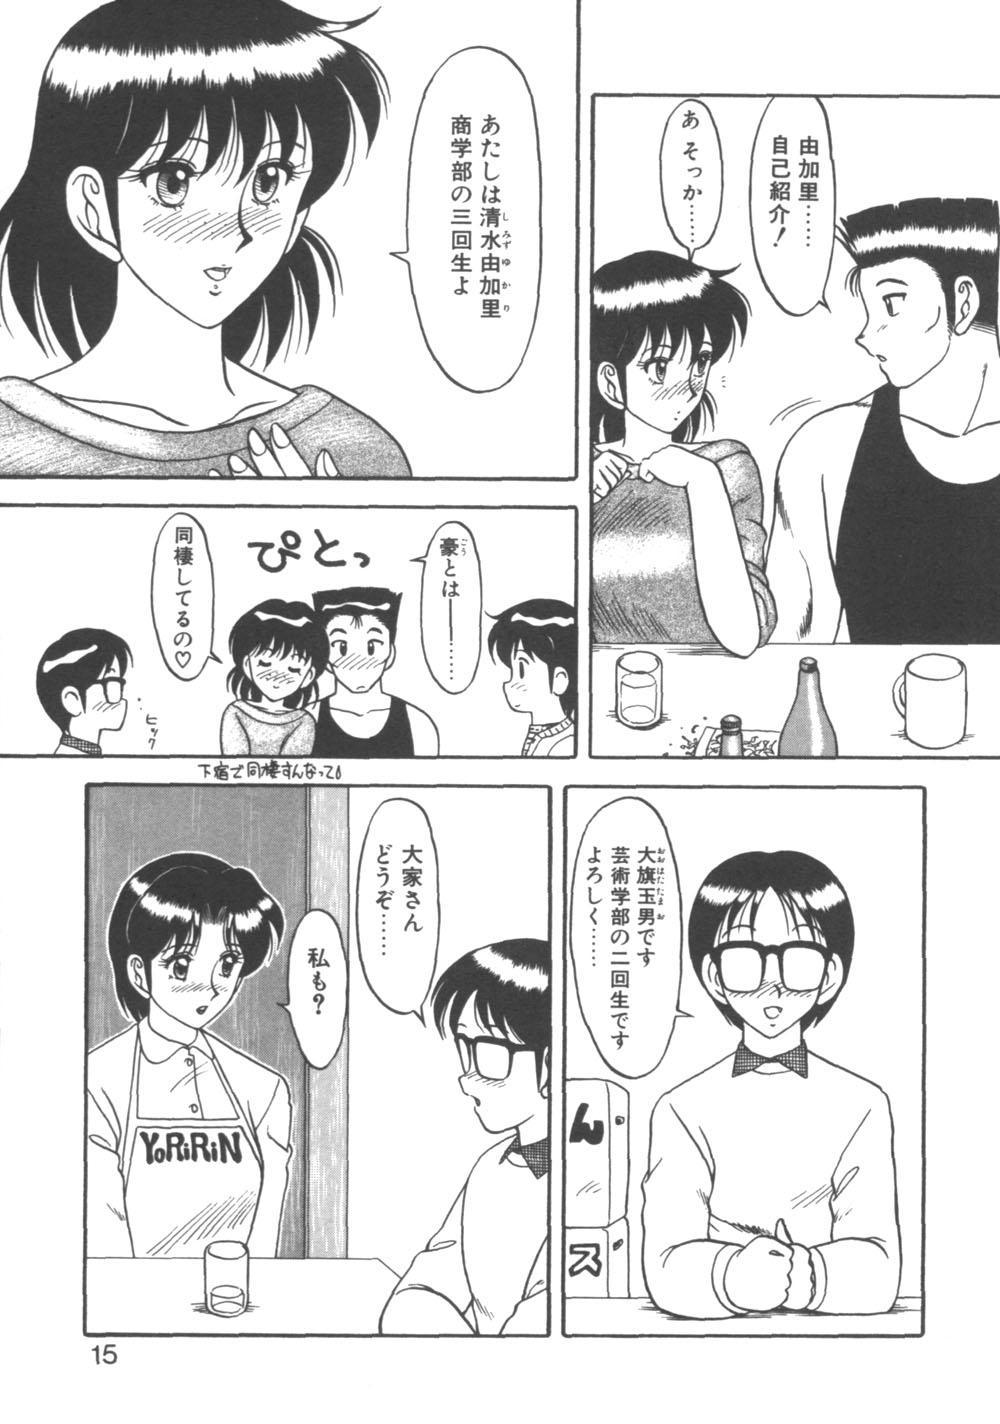 Genki ni Narisou 14